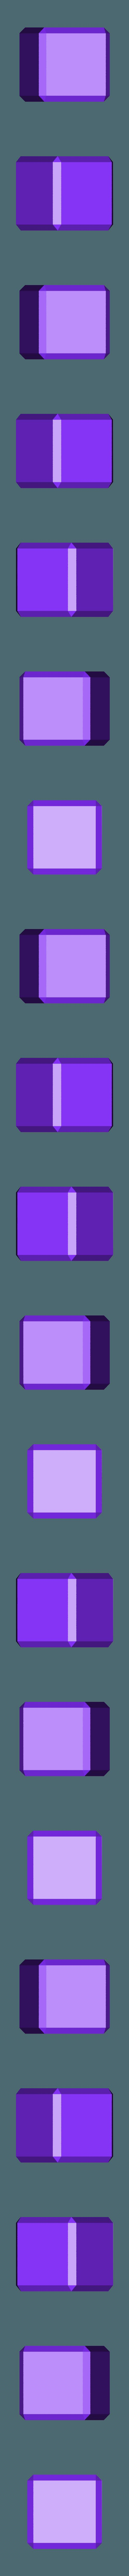 unitcube.stl Download free STL file Nesting Cubes, Recursive Cubes, Cubes within Cubes • 3D printer template, LGBU